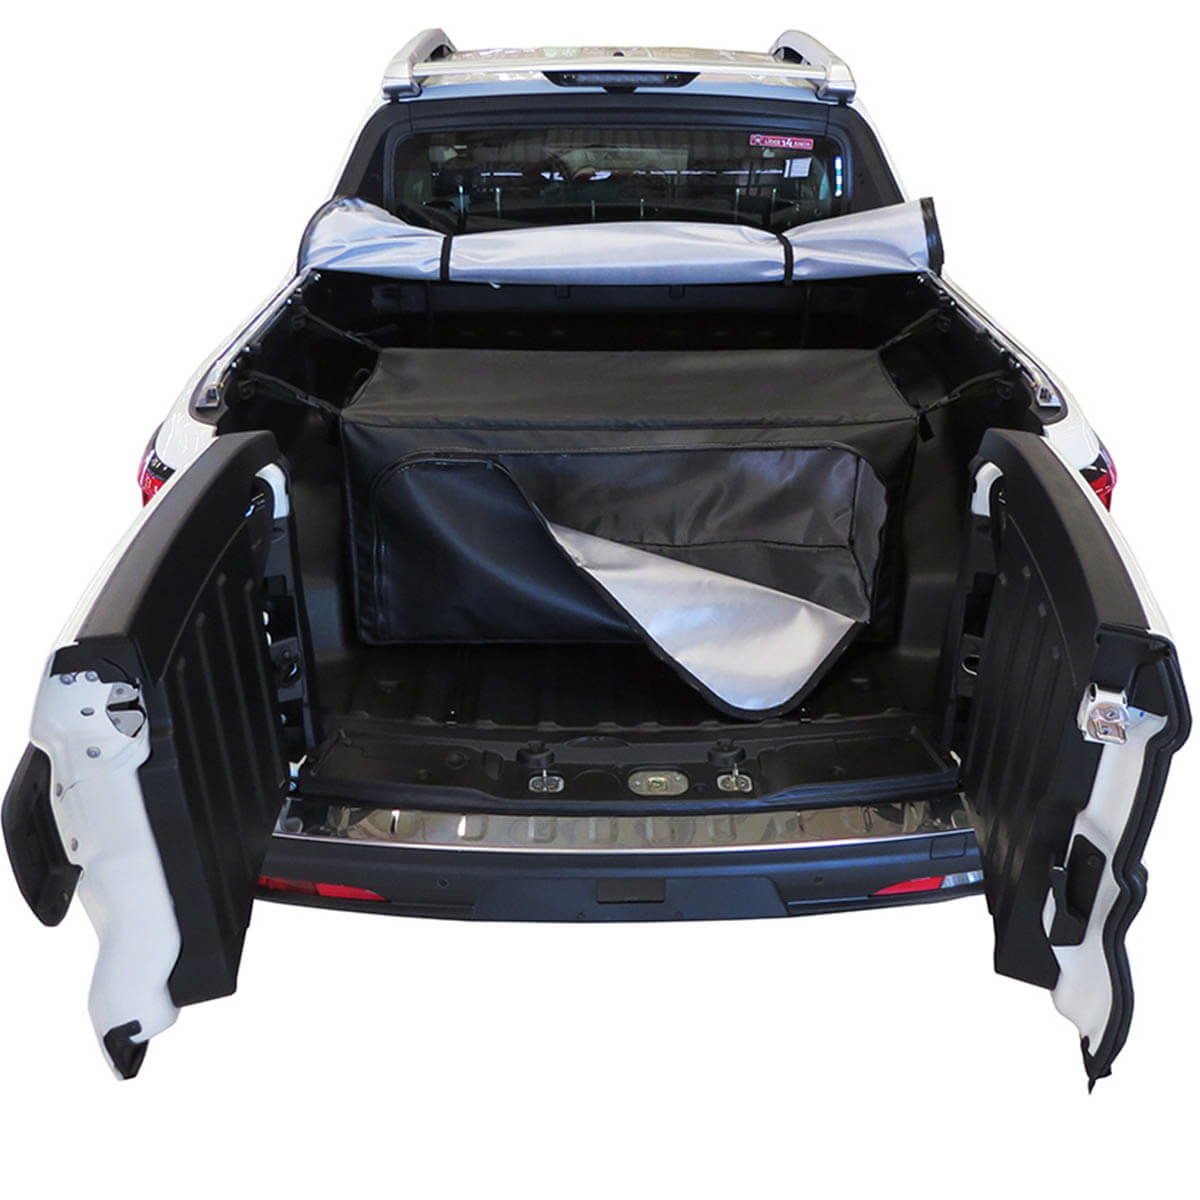 Bolsa para caçamba Fiat Toro 2017 a 2021